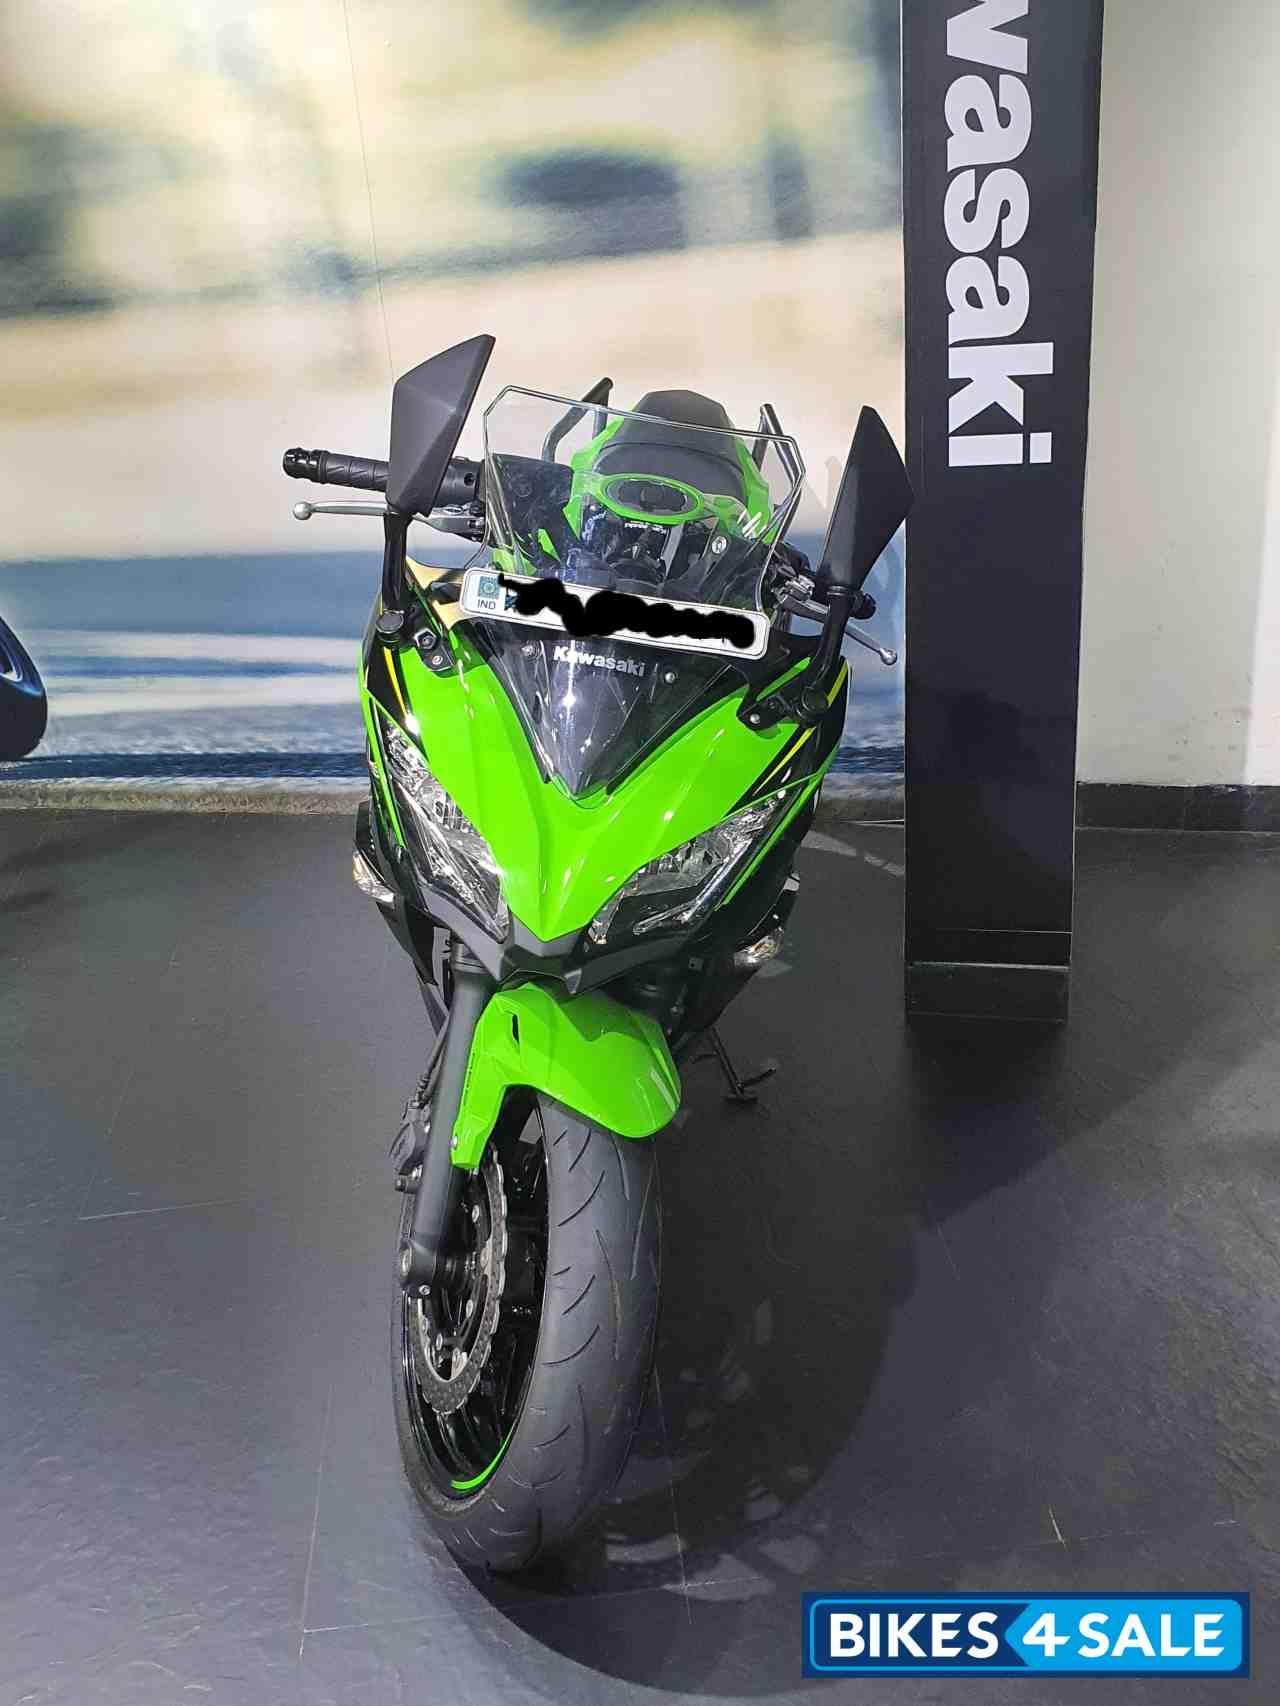 Used 2019 Model Kawasaki Ninja 650r For Sale In Kolkata Id 295551 Bikes4sale